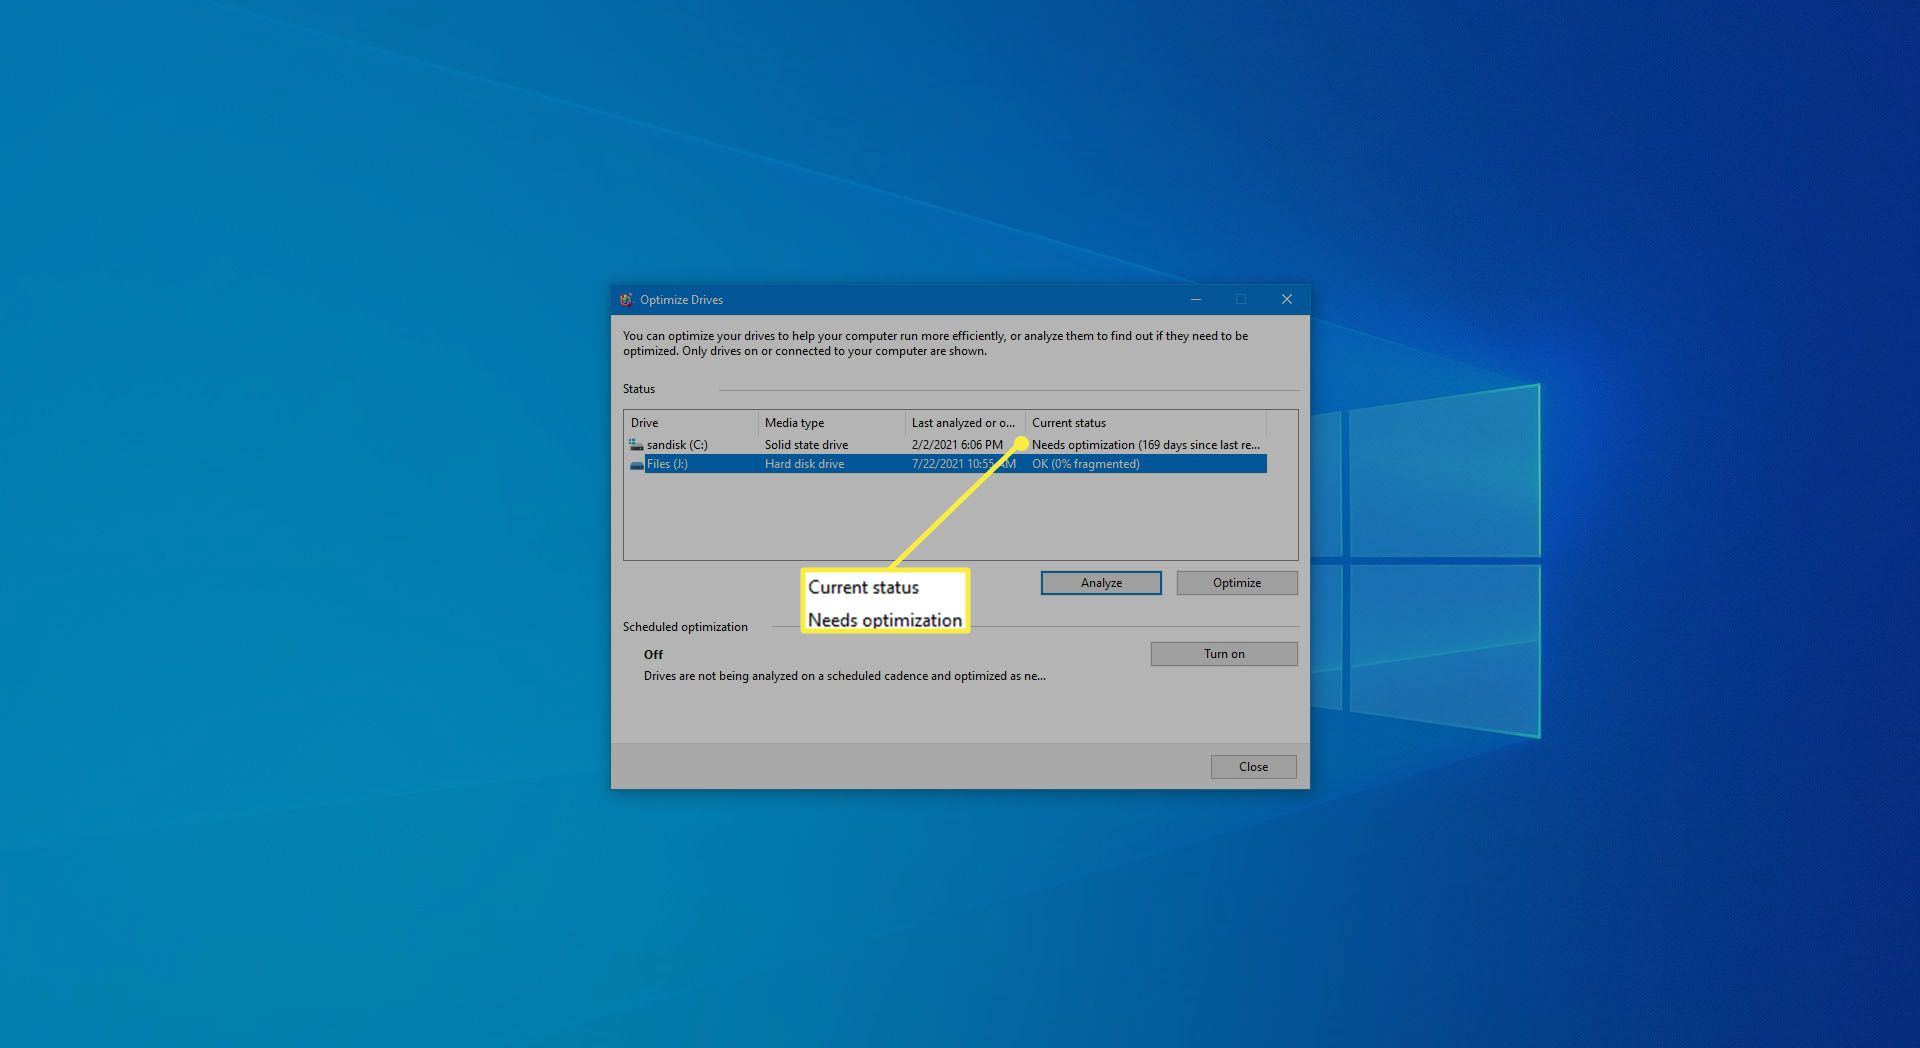 Current status in Drive optimization in Windows 10.